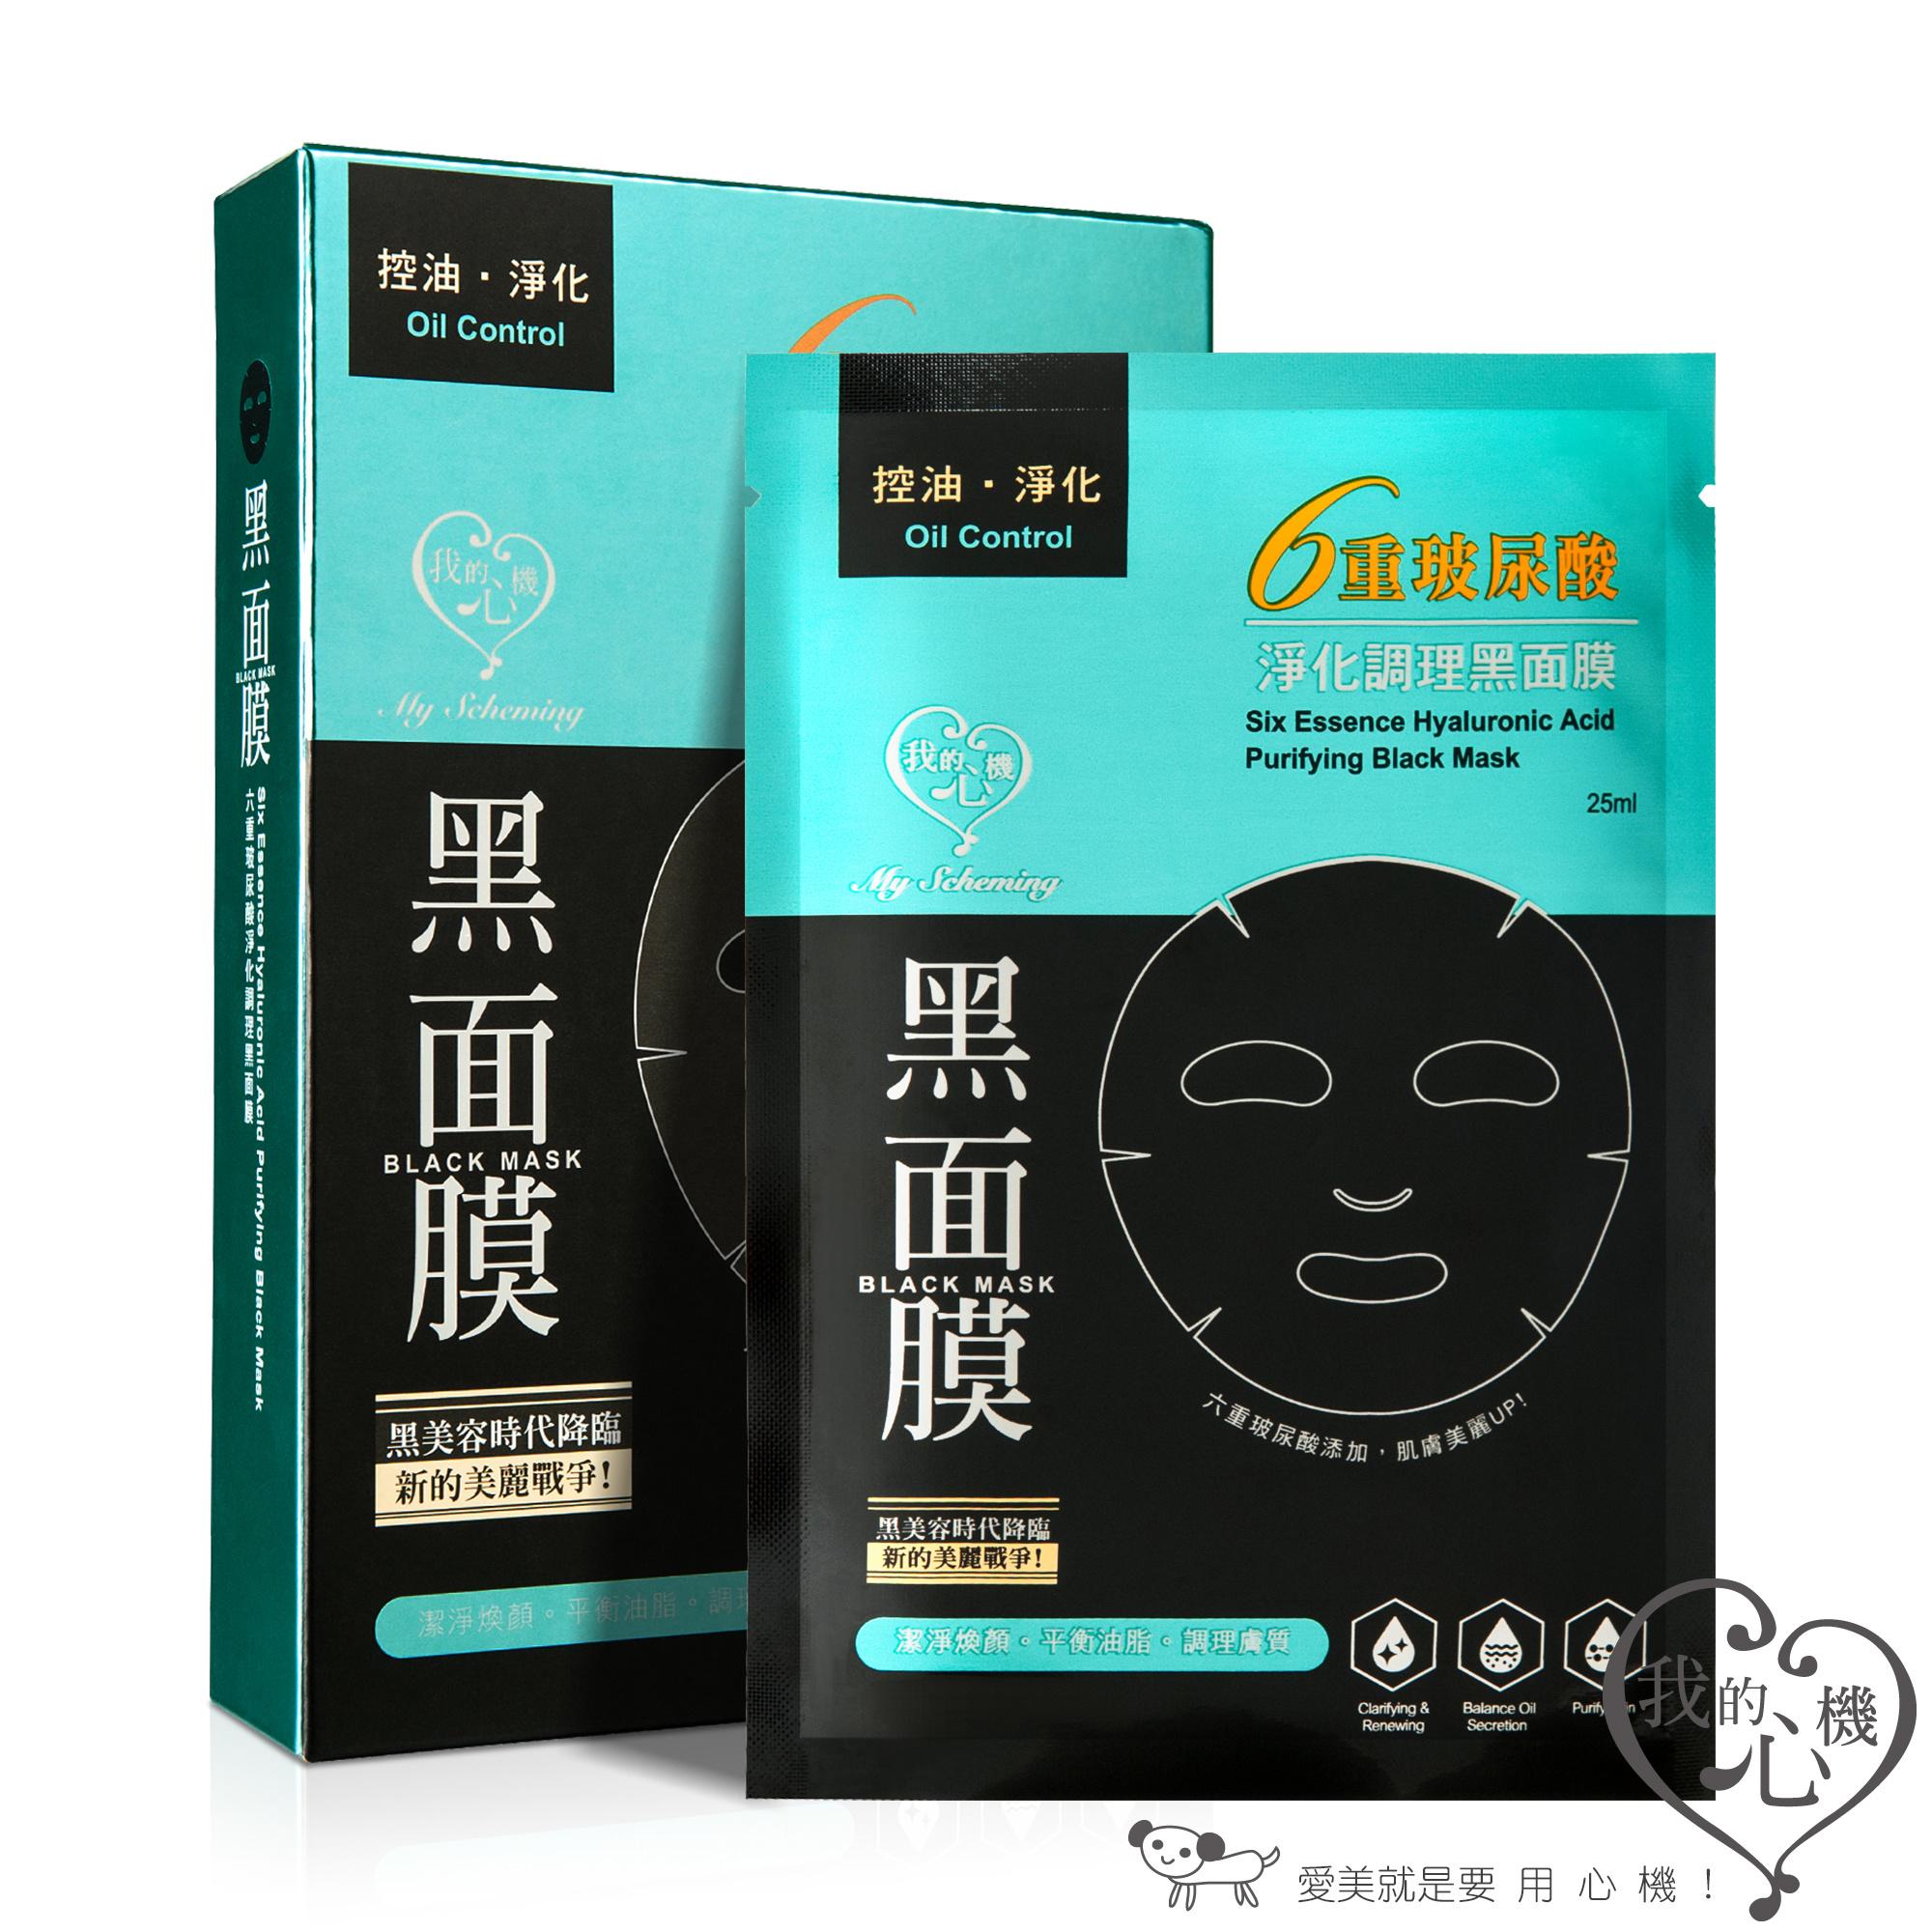 Six Essence Hyaluronic Acid Purifying Black Mask (5 Stk)-1